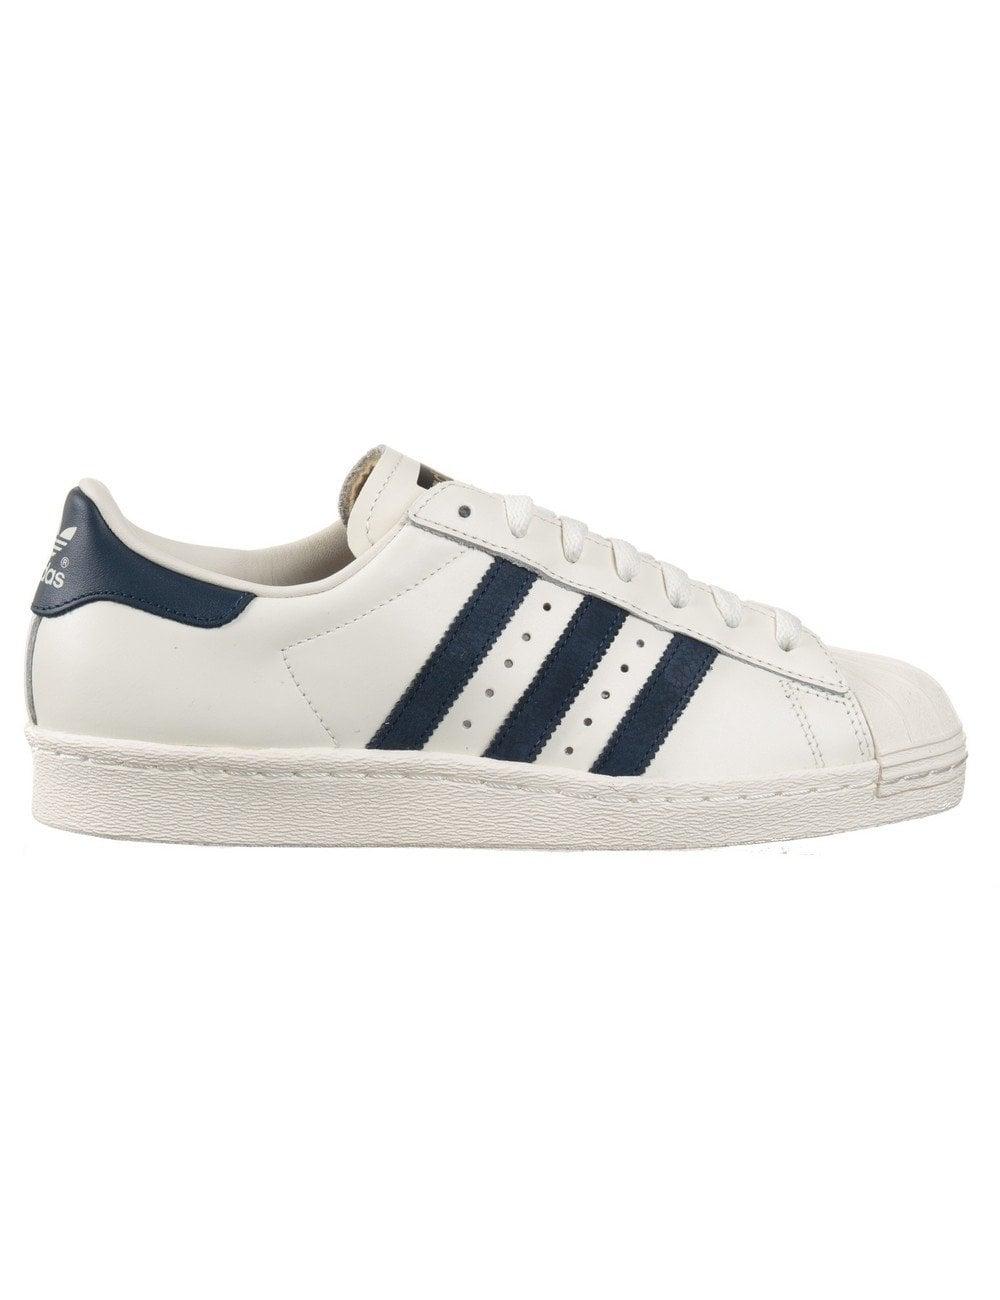 Superstar 80s Delux Shoes Vintage WhiteNavy